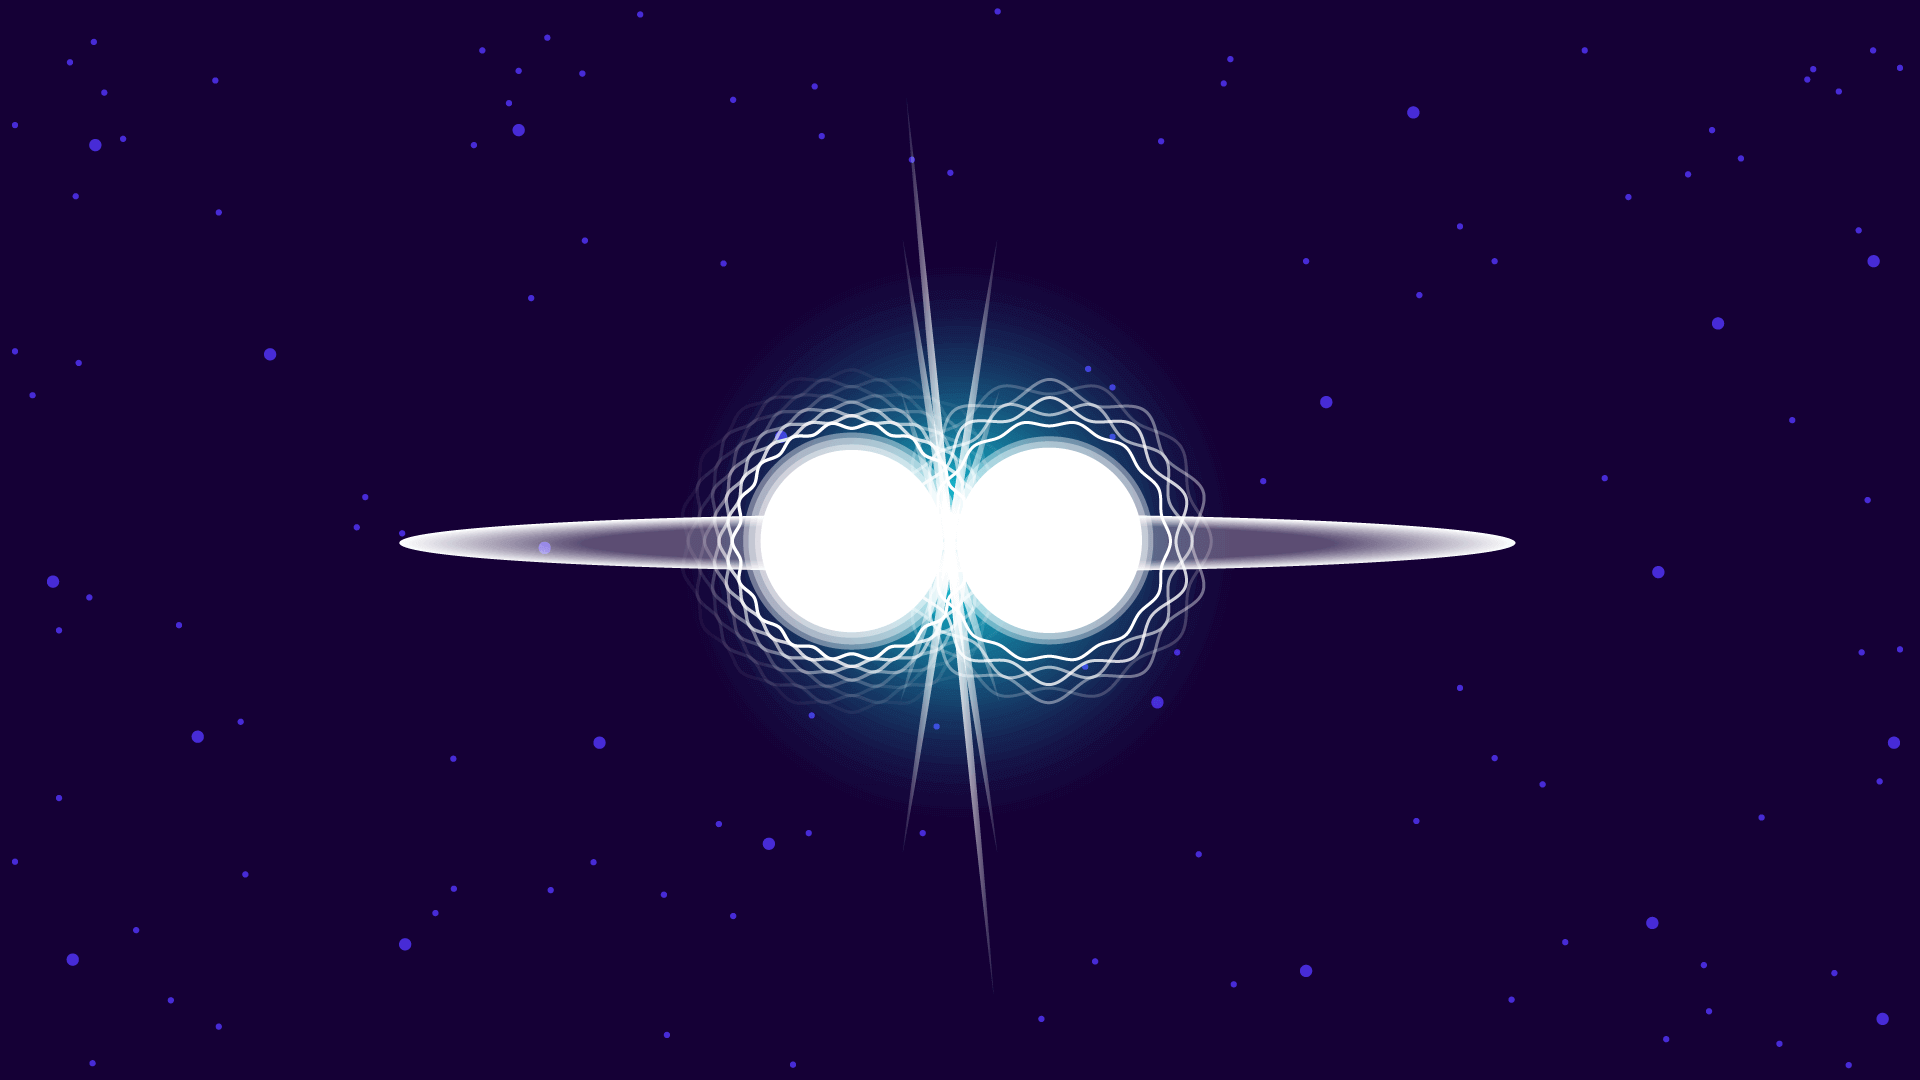 410_Gamma_Ray_Burst_Kurzgesagt Project Pic 4